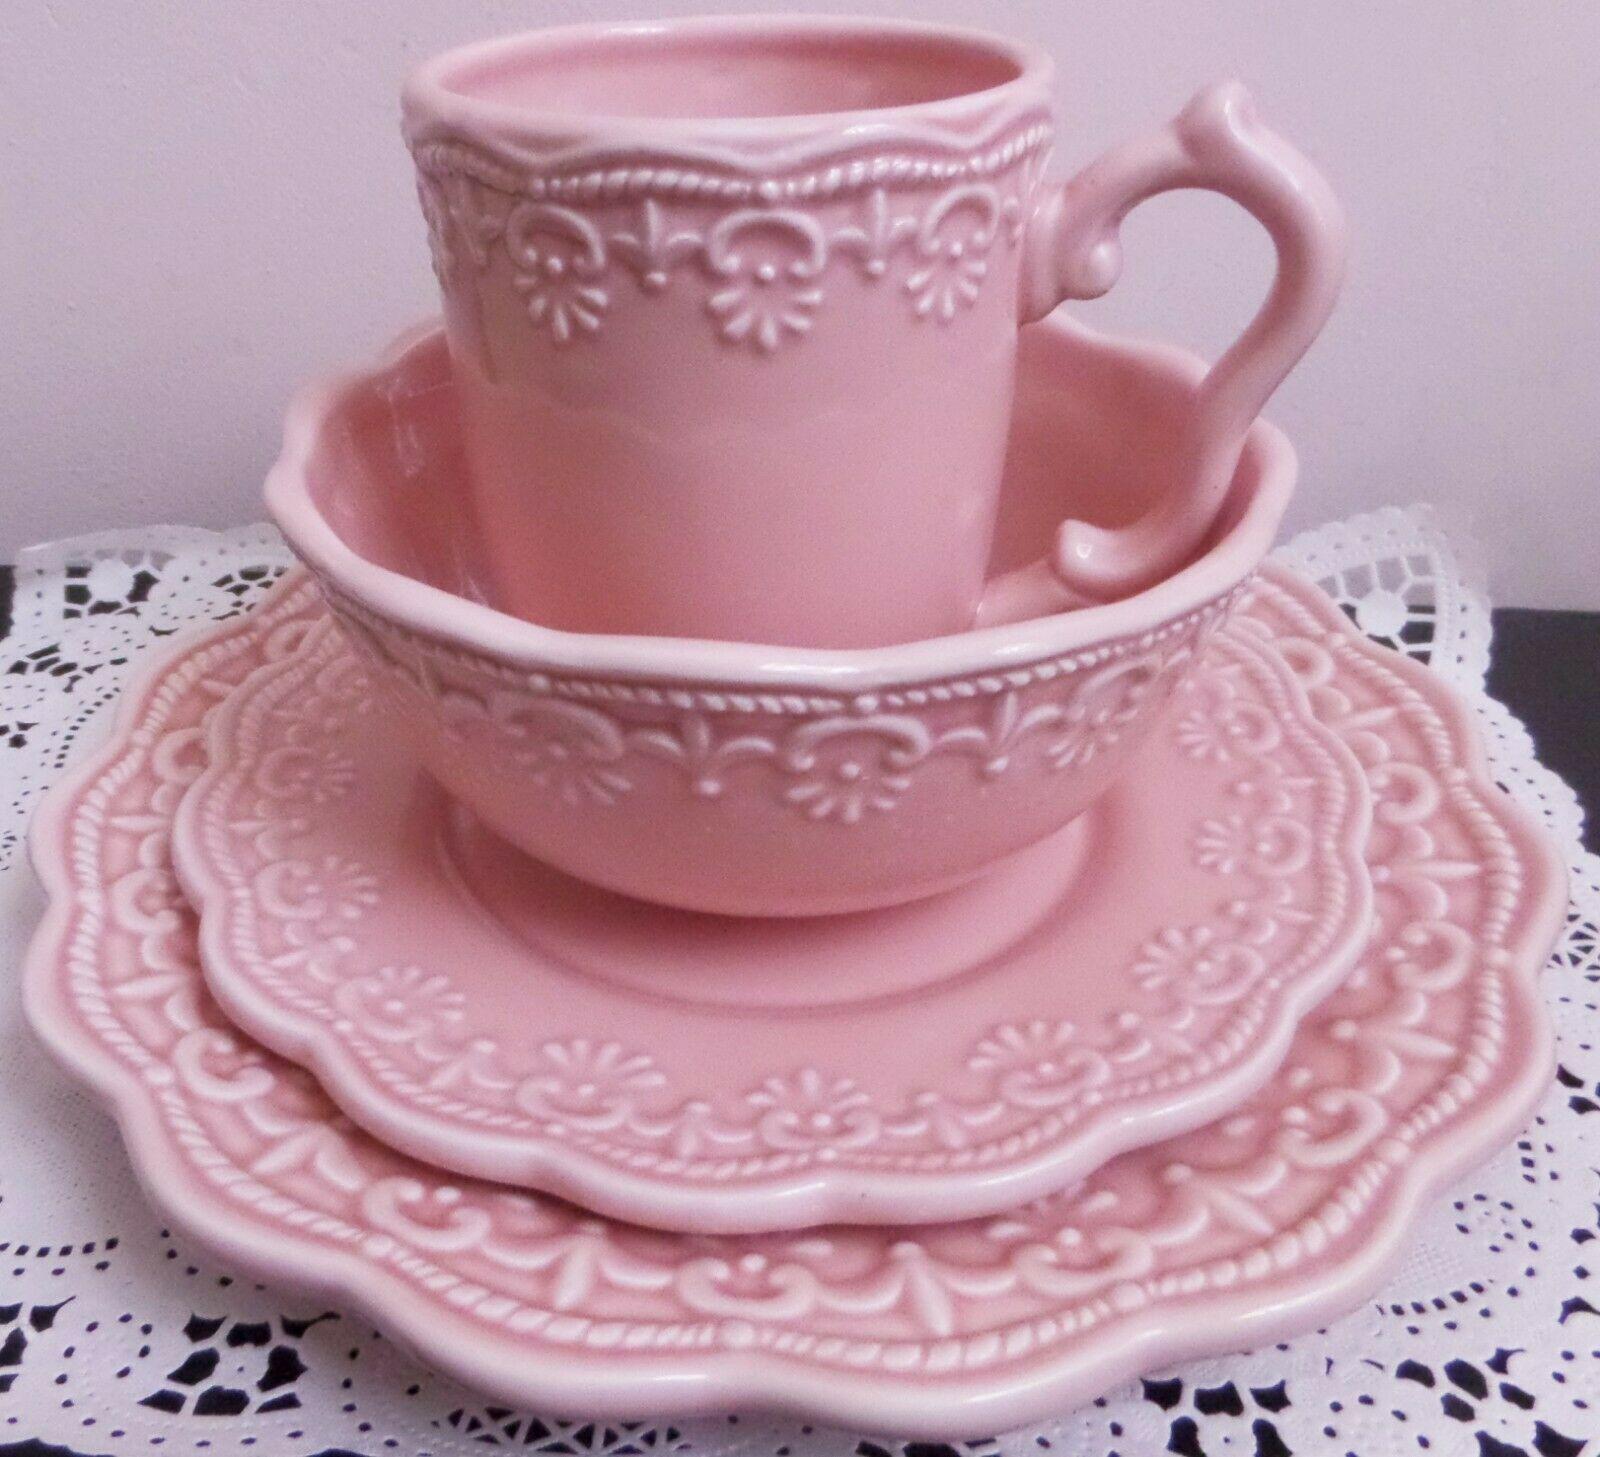 Victorian Lace 4 Piece Pink Ceramic Dinnerware Set  - Dinnerware - Ideas of Dinnerware #Dinnerware #casualdinnerware